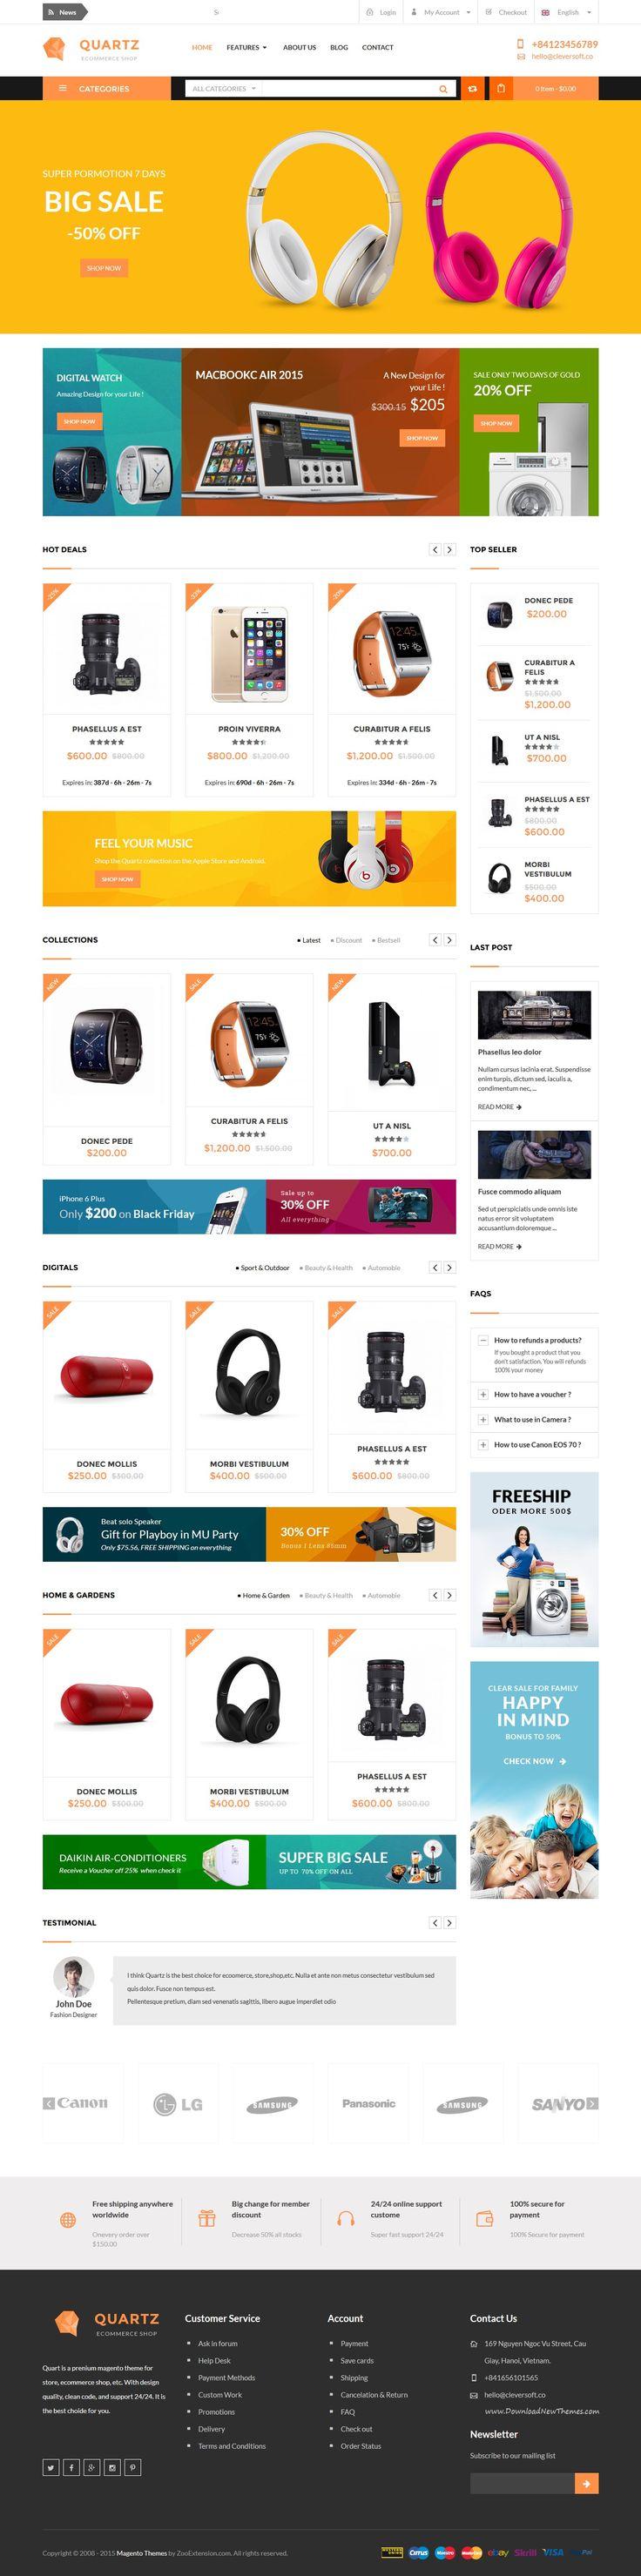 Quartz is premium responsive magento theme #digital #electronics #eCommerce #shop #website